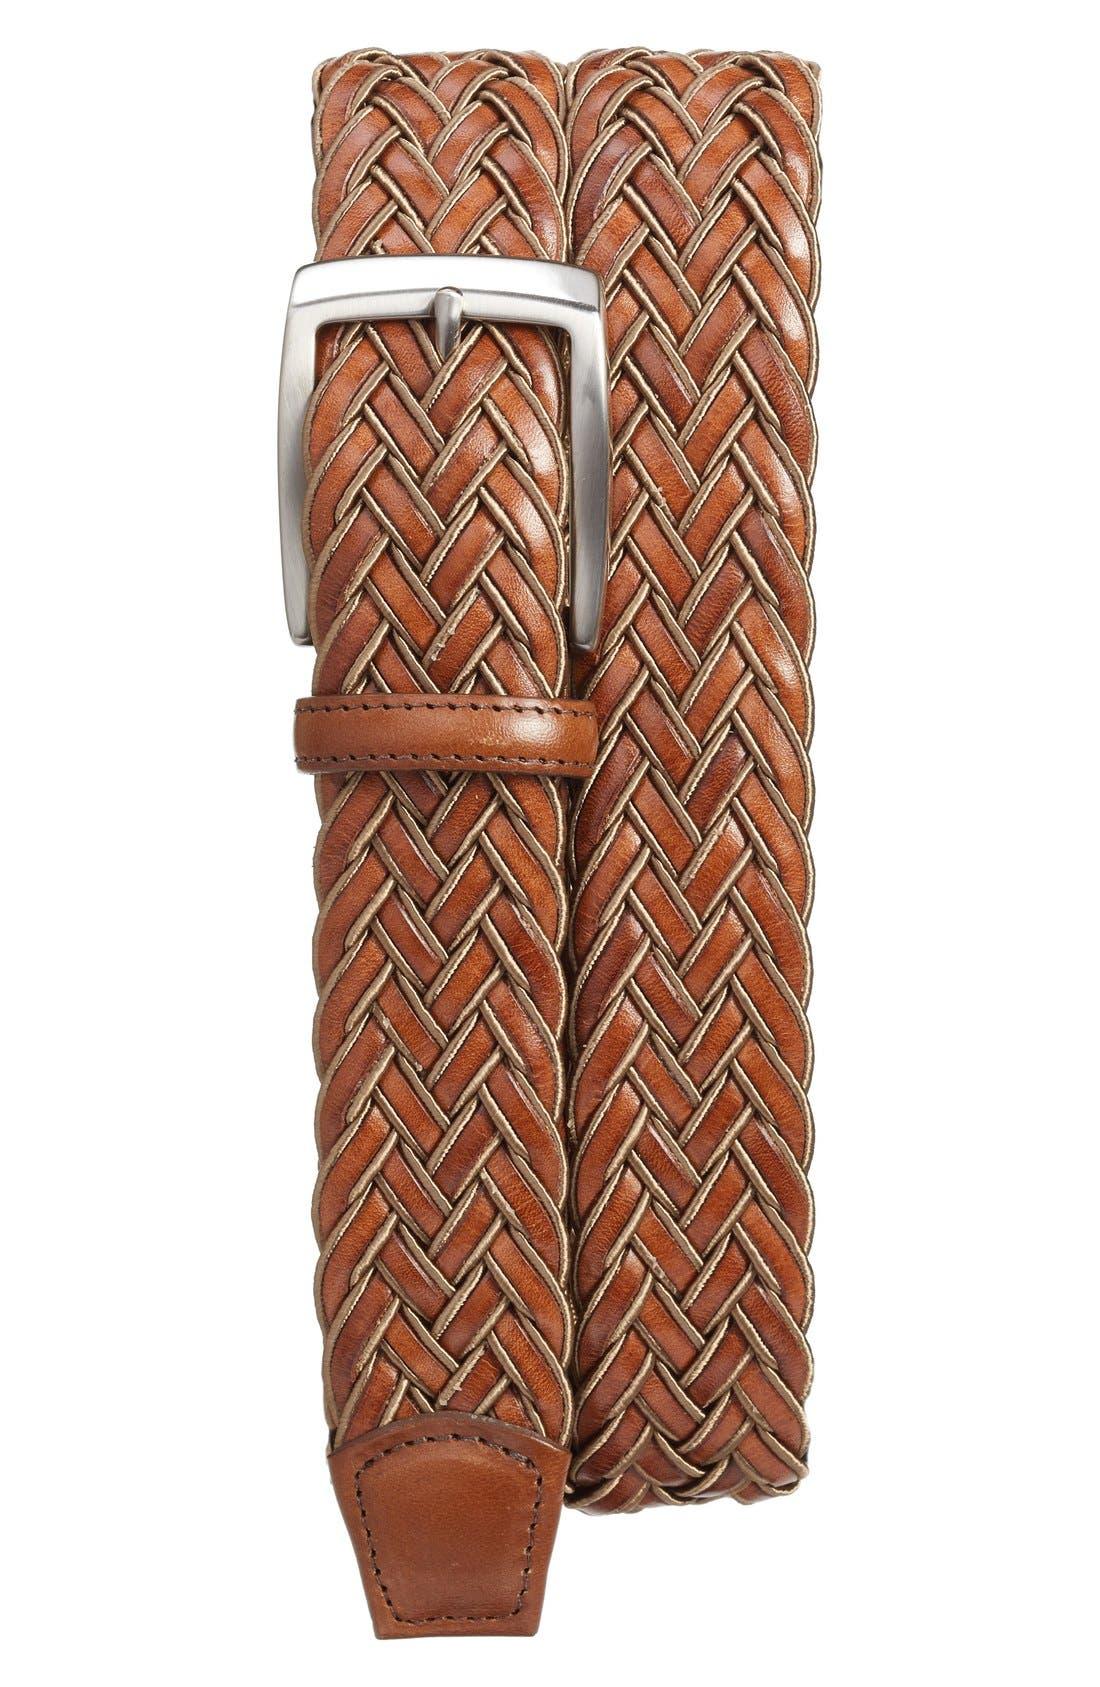 Alternate Image 1 Selected - Torino Belts Braided Belt